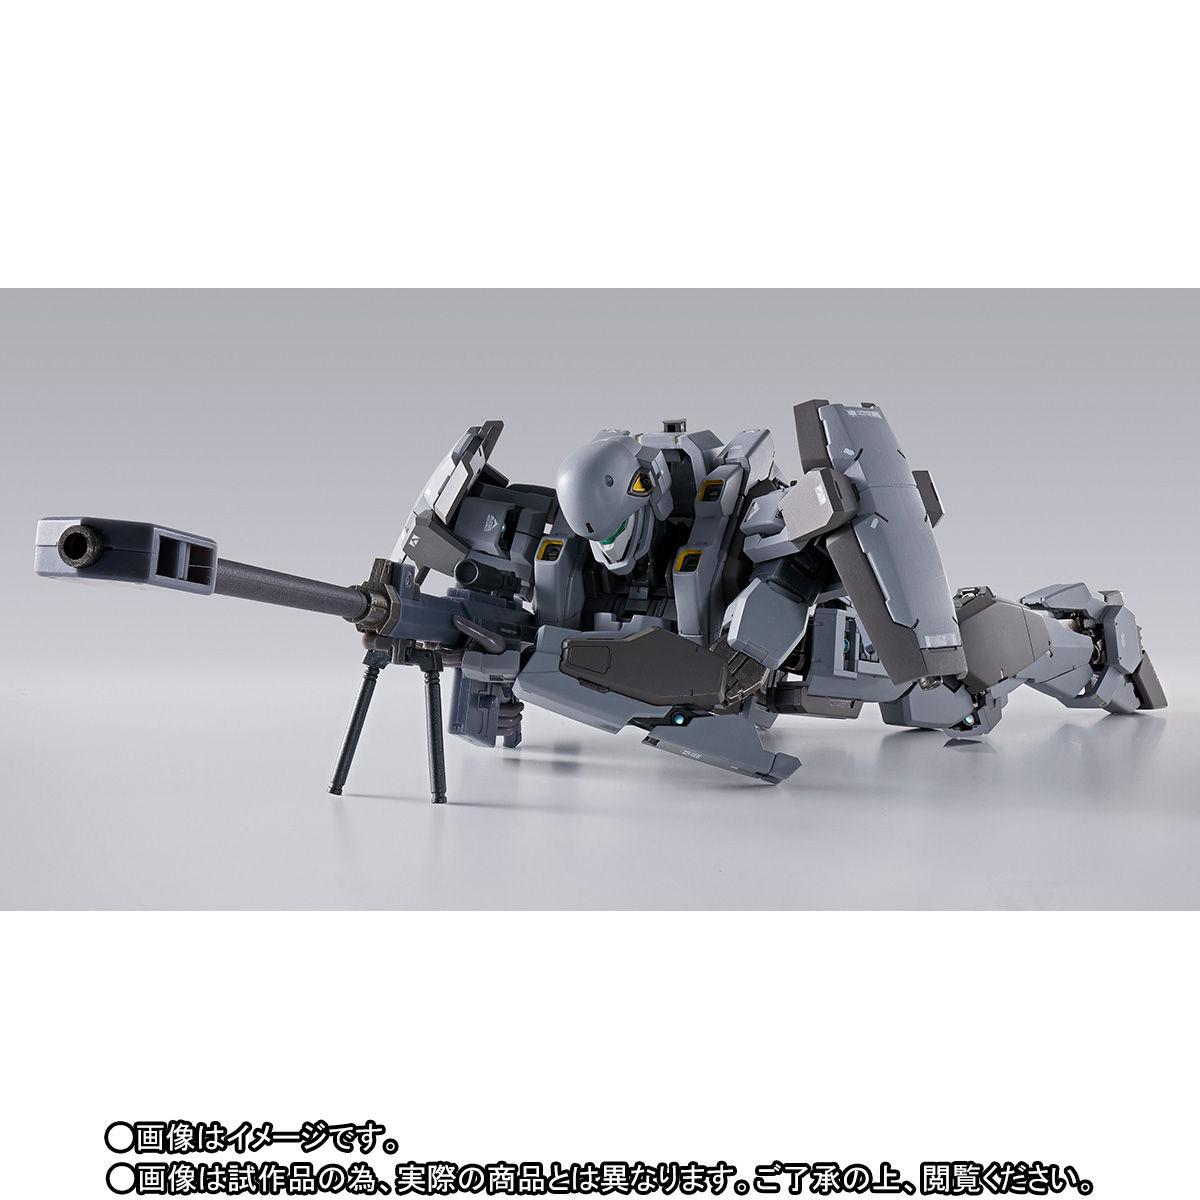 METAL BUILD『ガーンズバック Ver.IV|フルメタル・パニック!IV』可動フィギュア-007